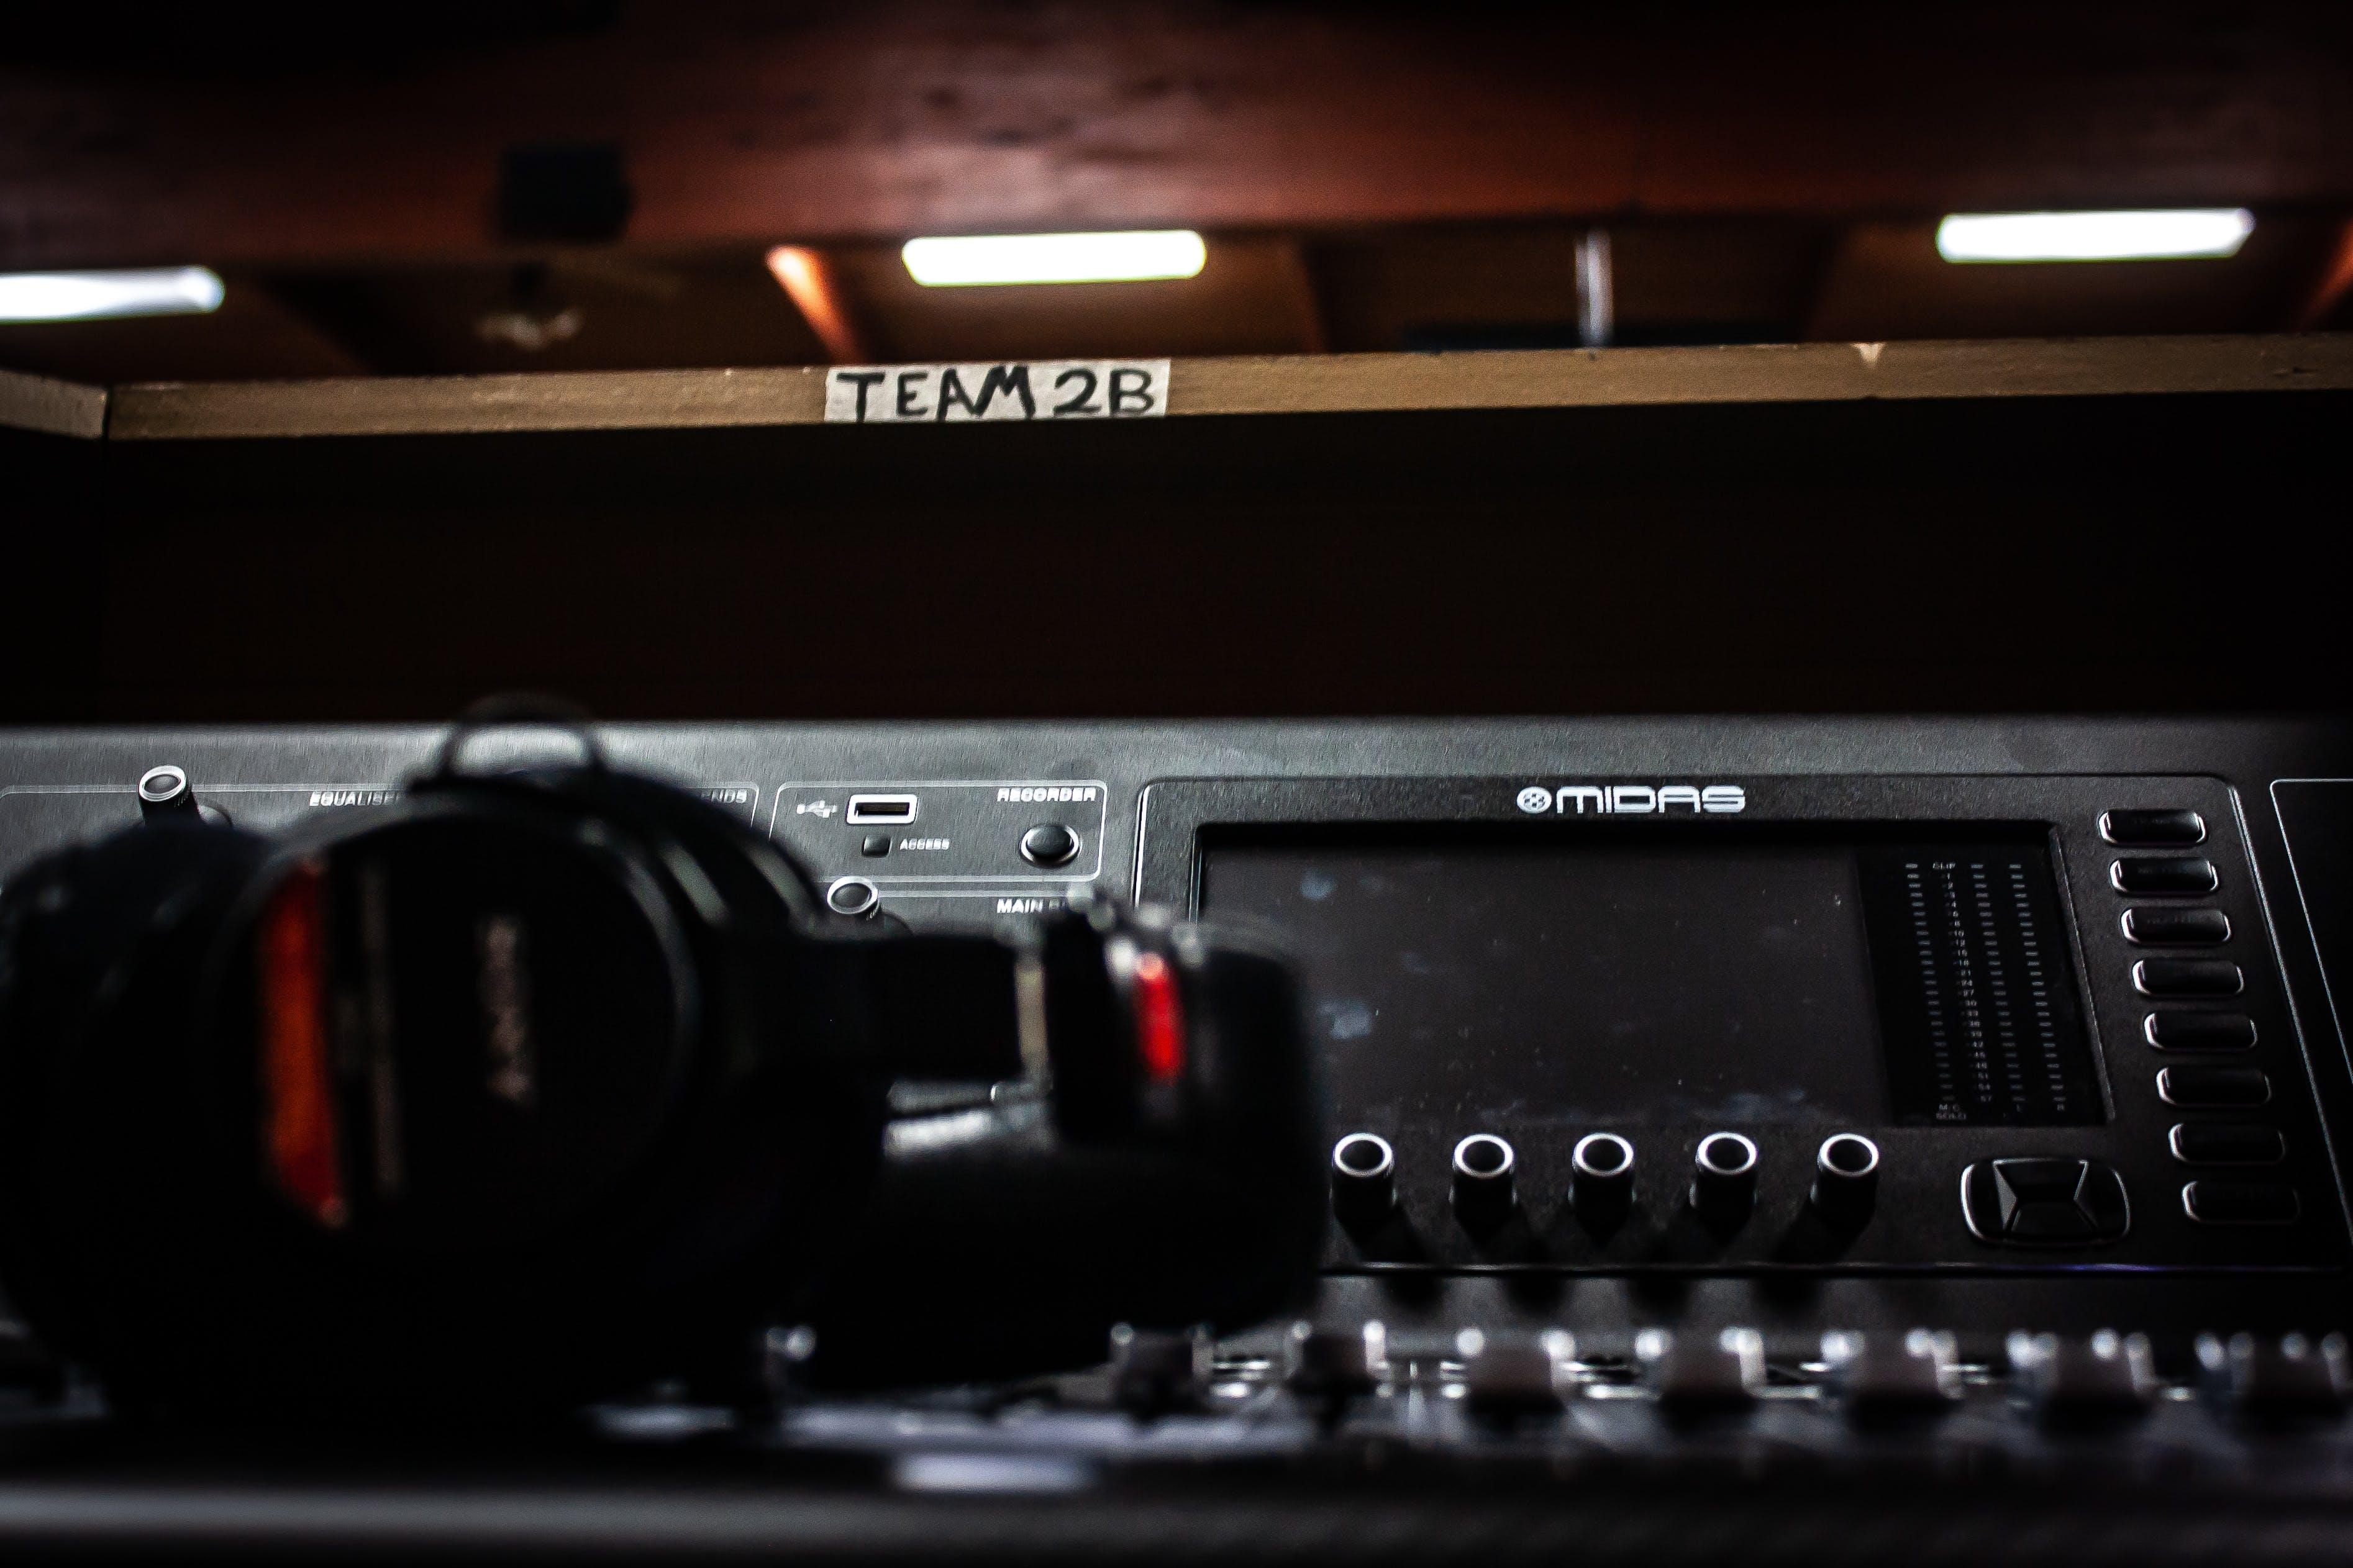 auriculars, enginyeria de so, enregistrament de so